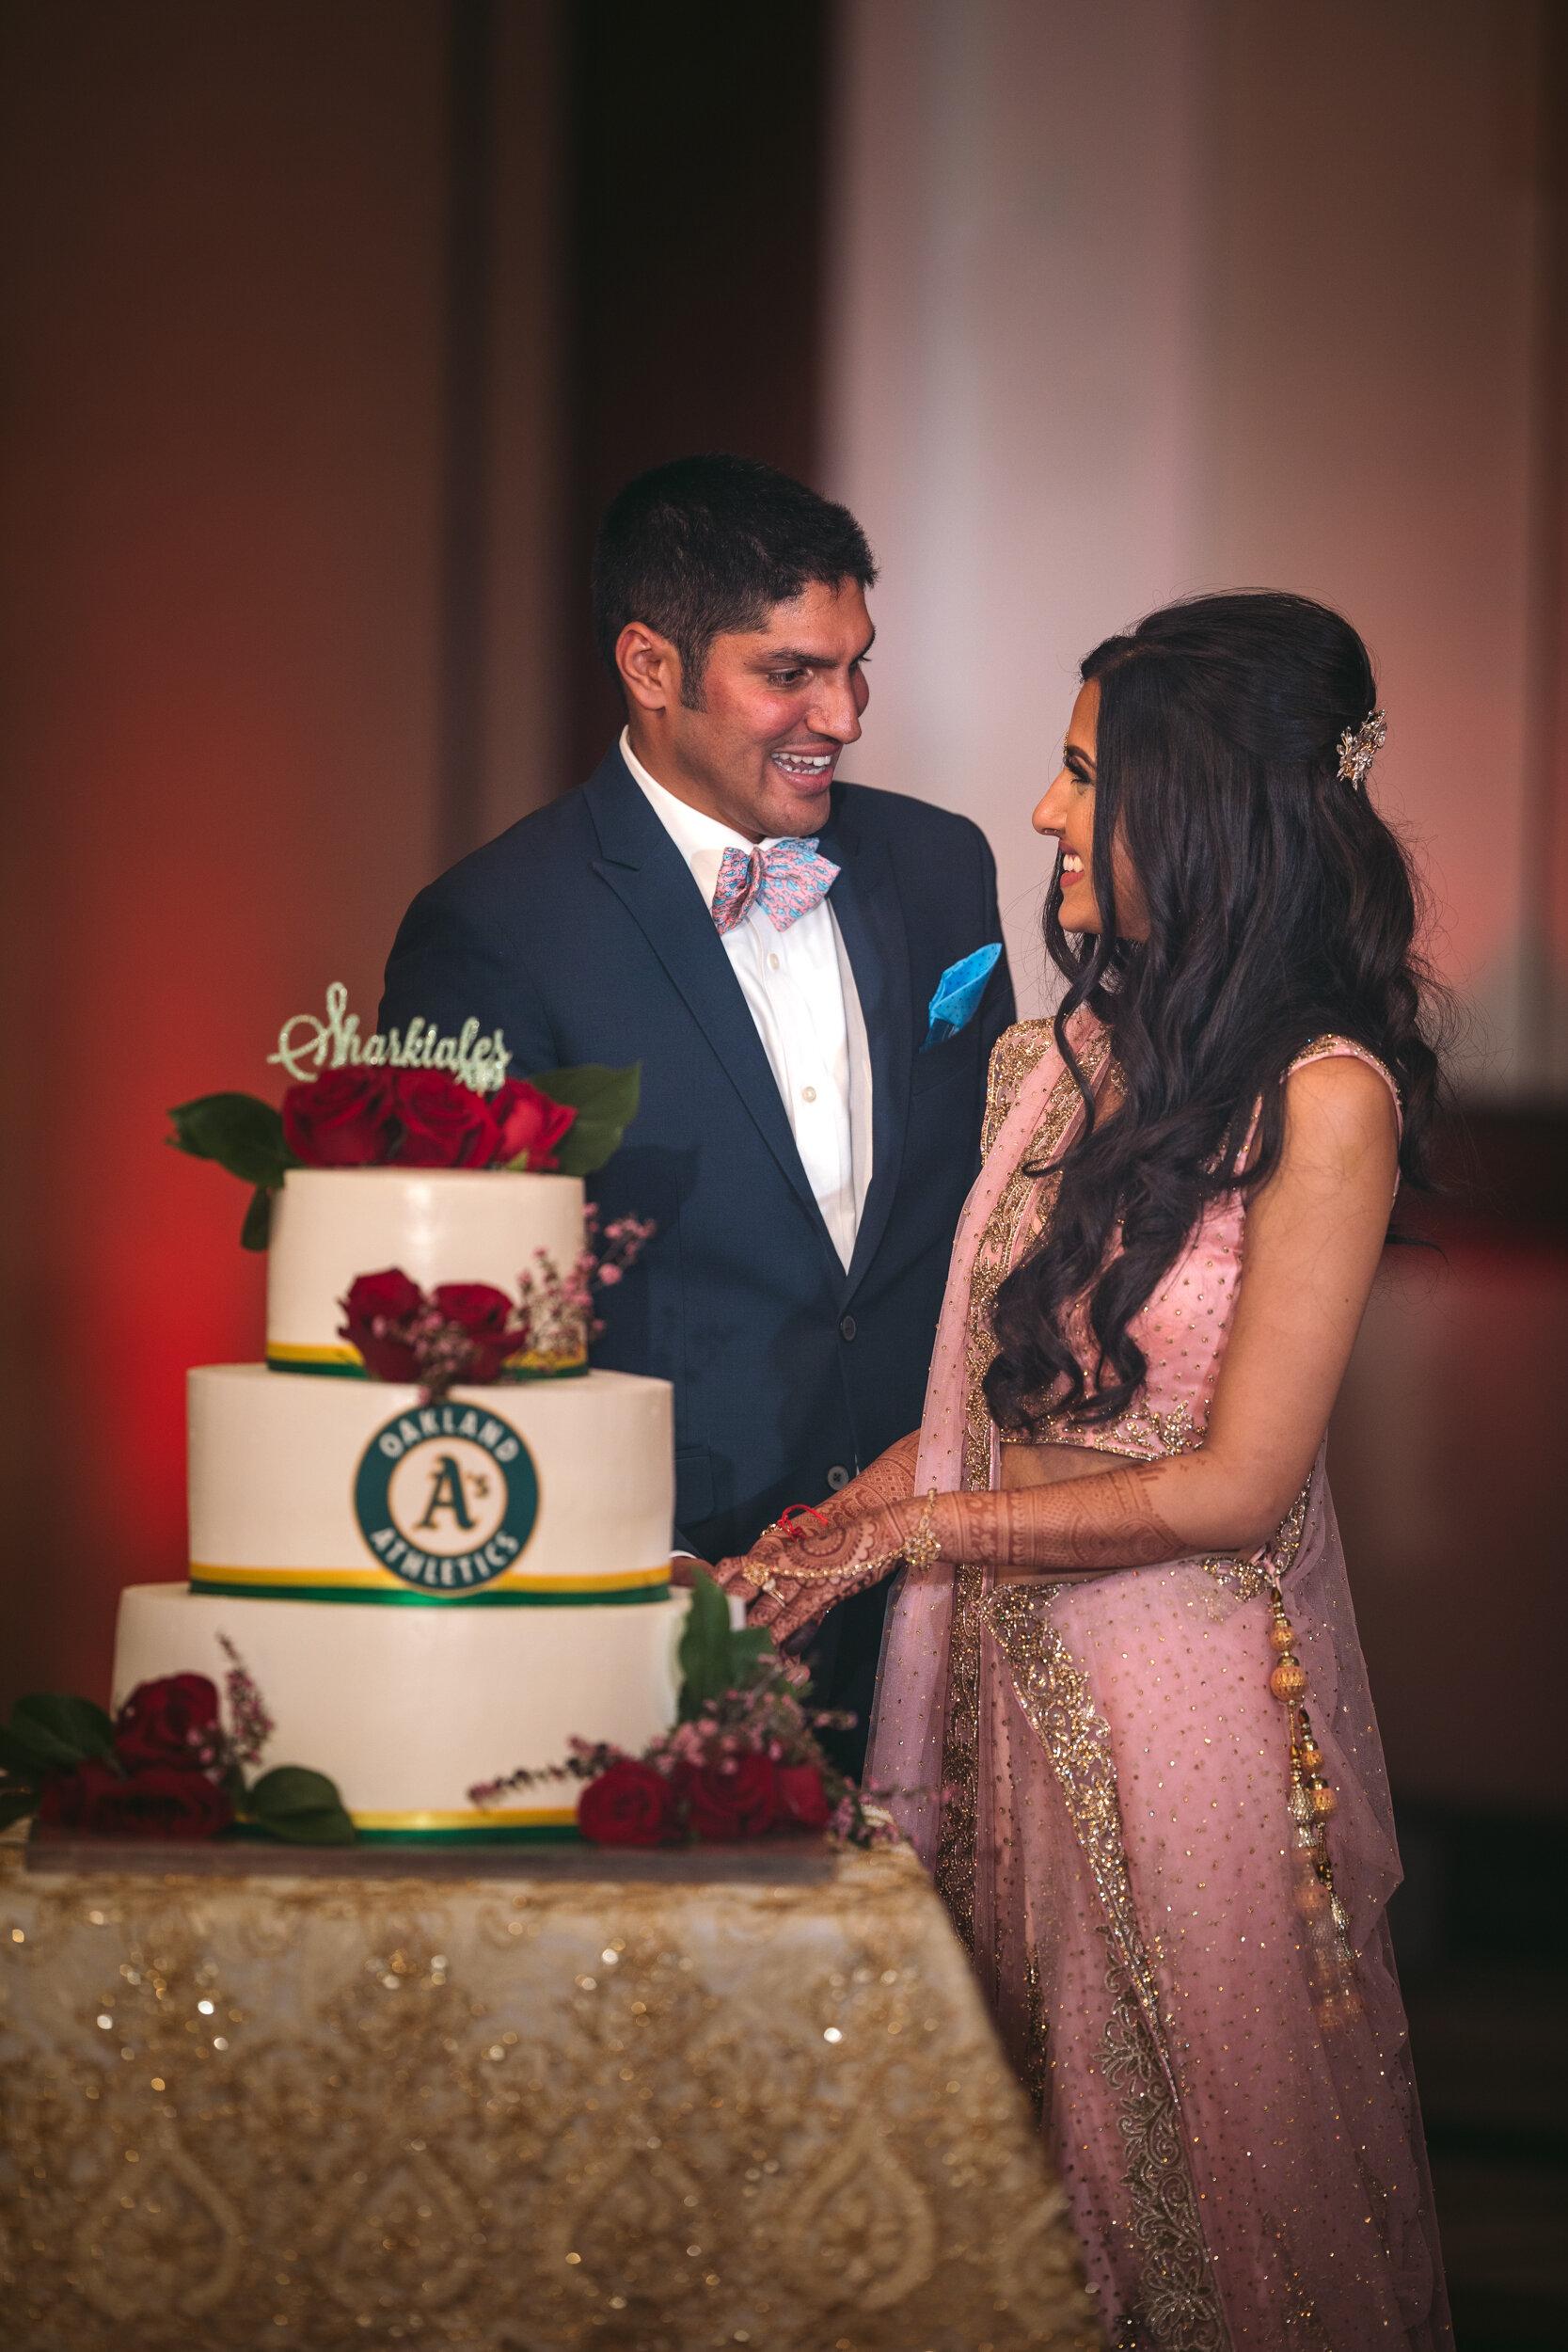 Phoenix wedding photographers - 25.jpg